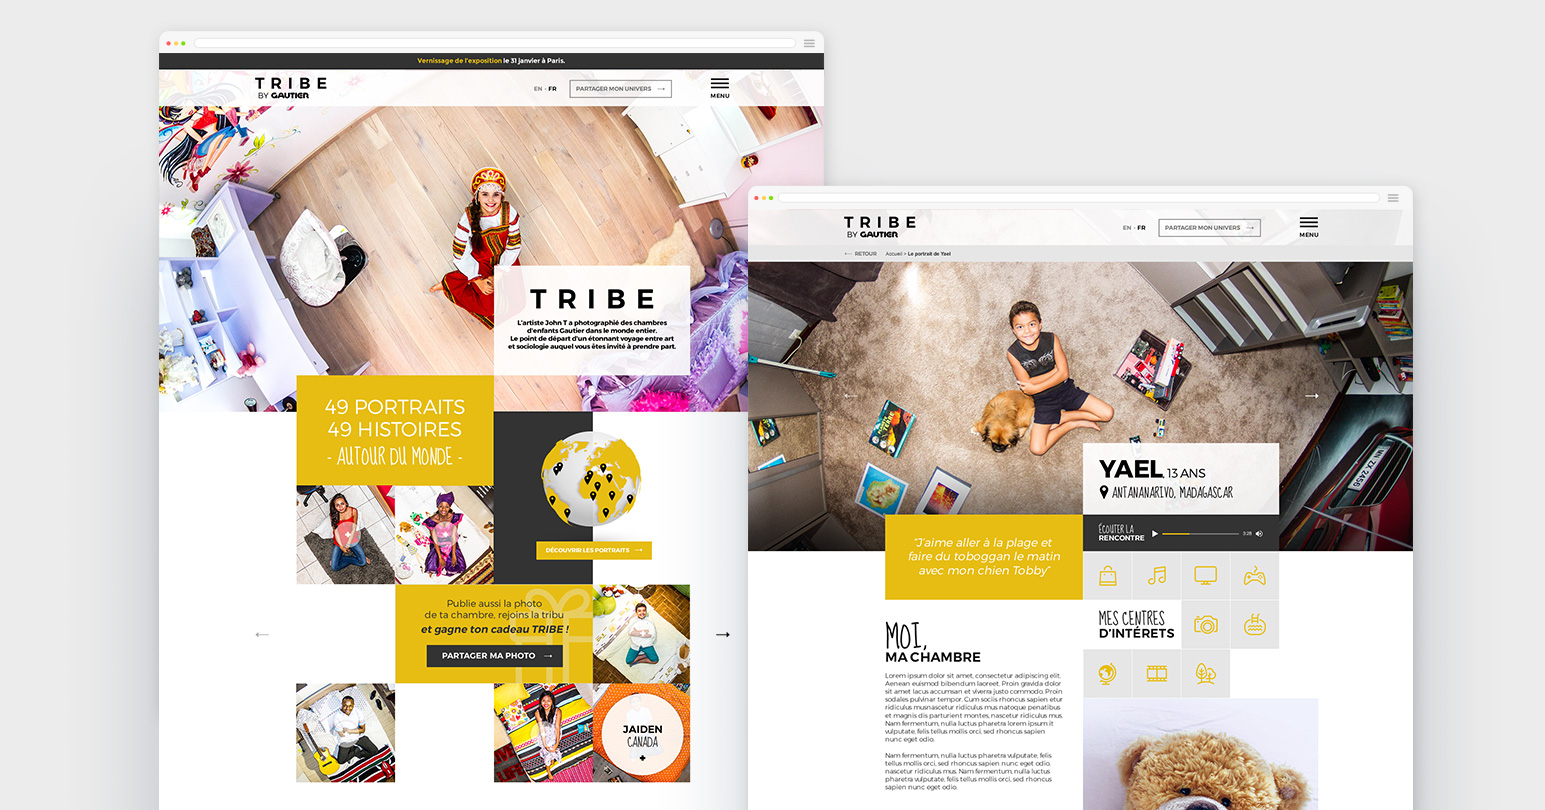 Création du site web TRIBE by Gautier